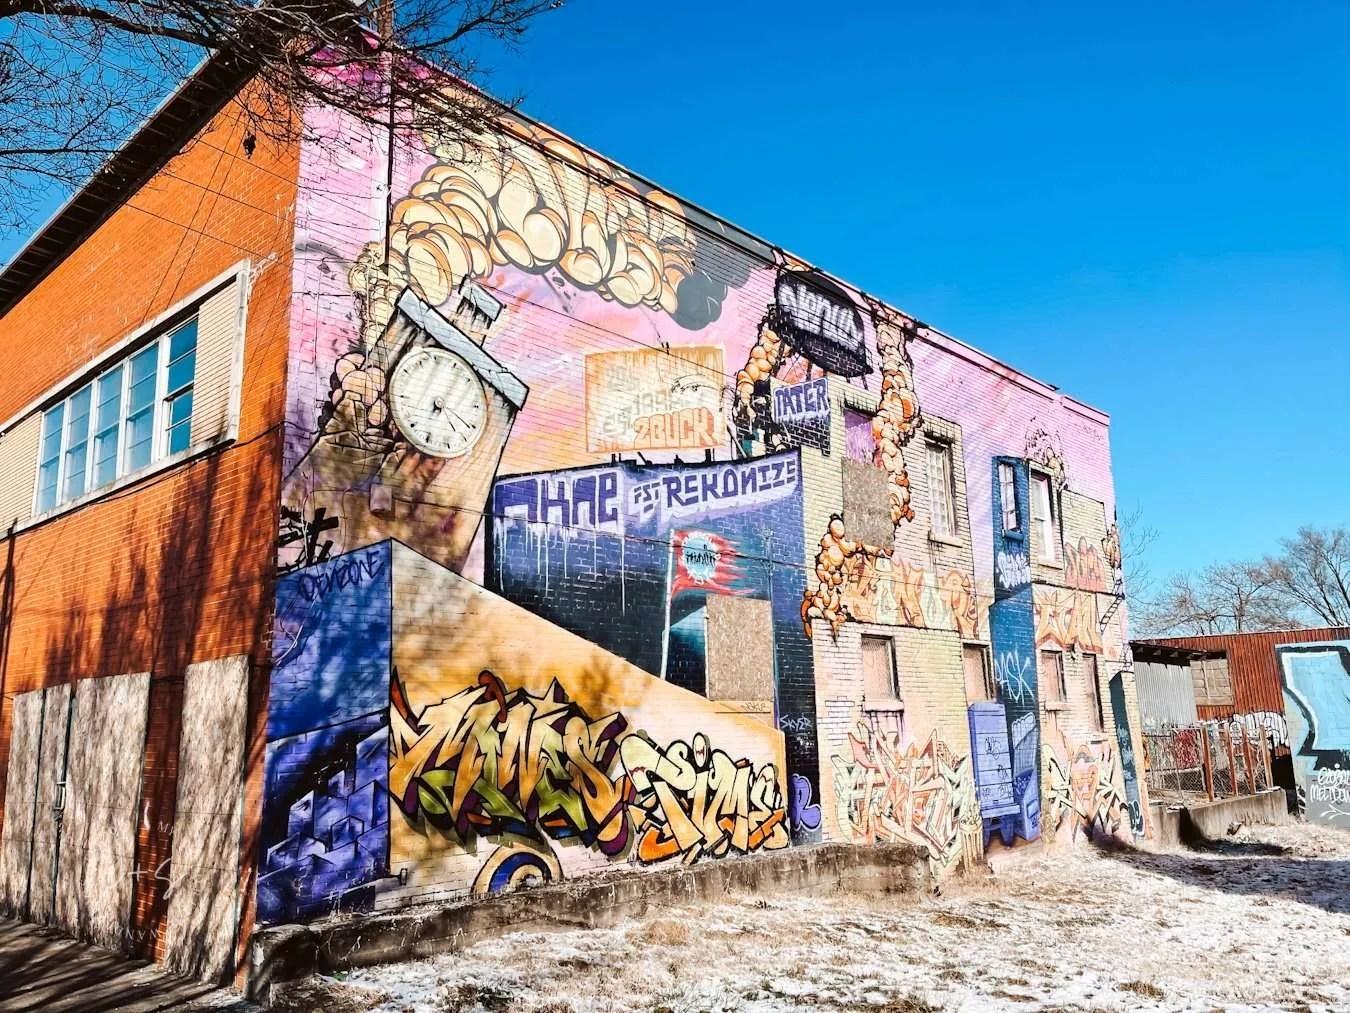 louisville graffiti mural